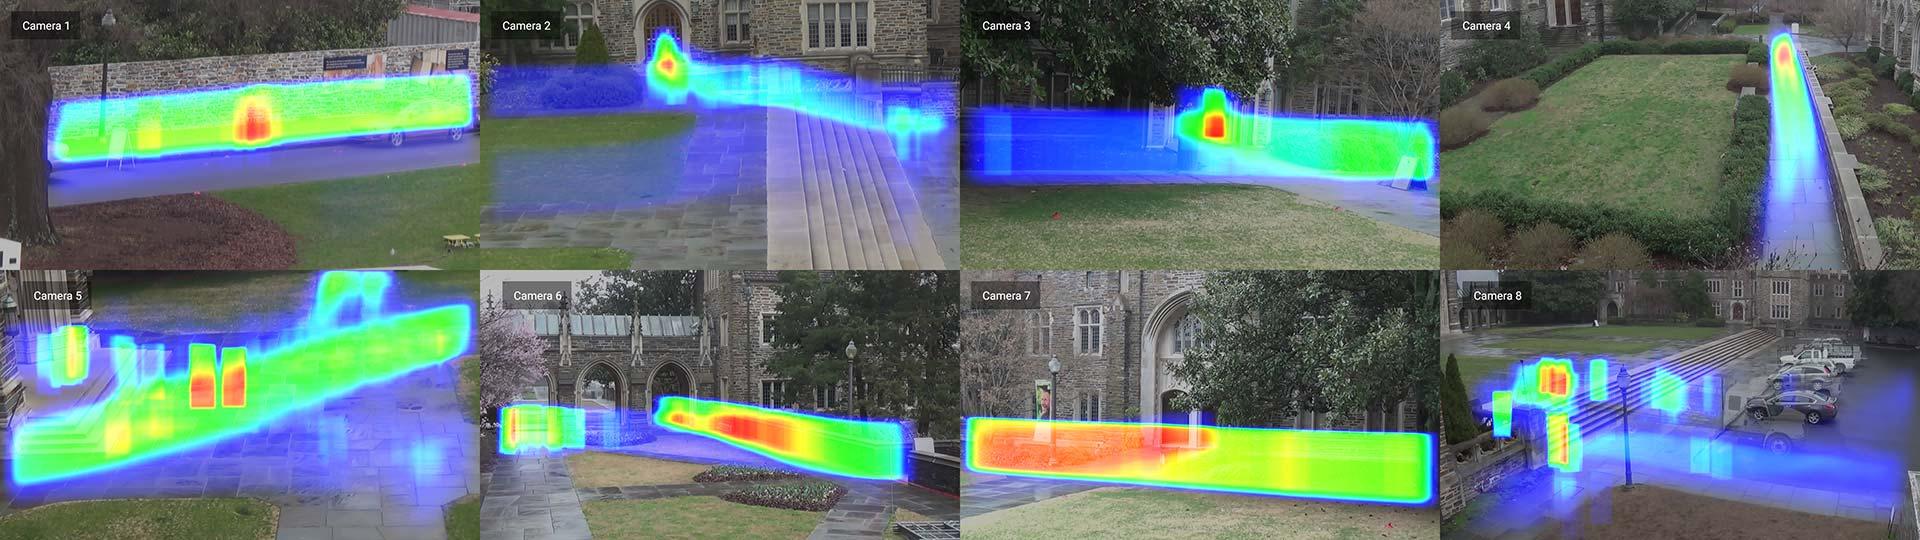 Duke MTMC pedestrian detection saliency maps for 8 cameras deployed on campus © Adam Harvey / MegaPixels.cc